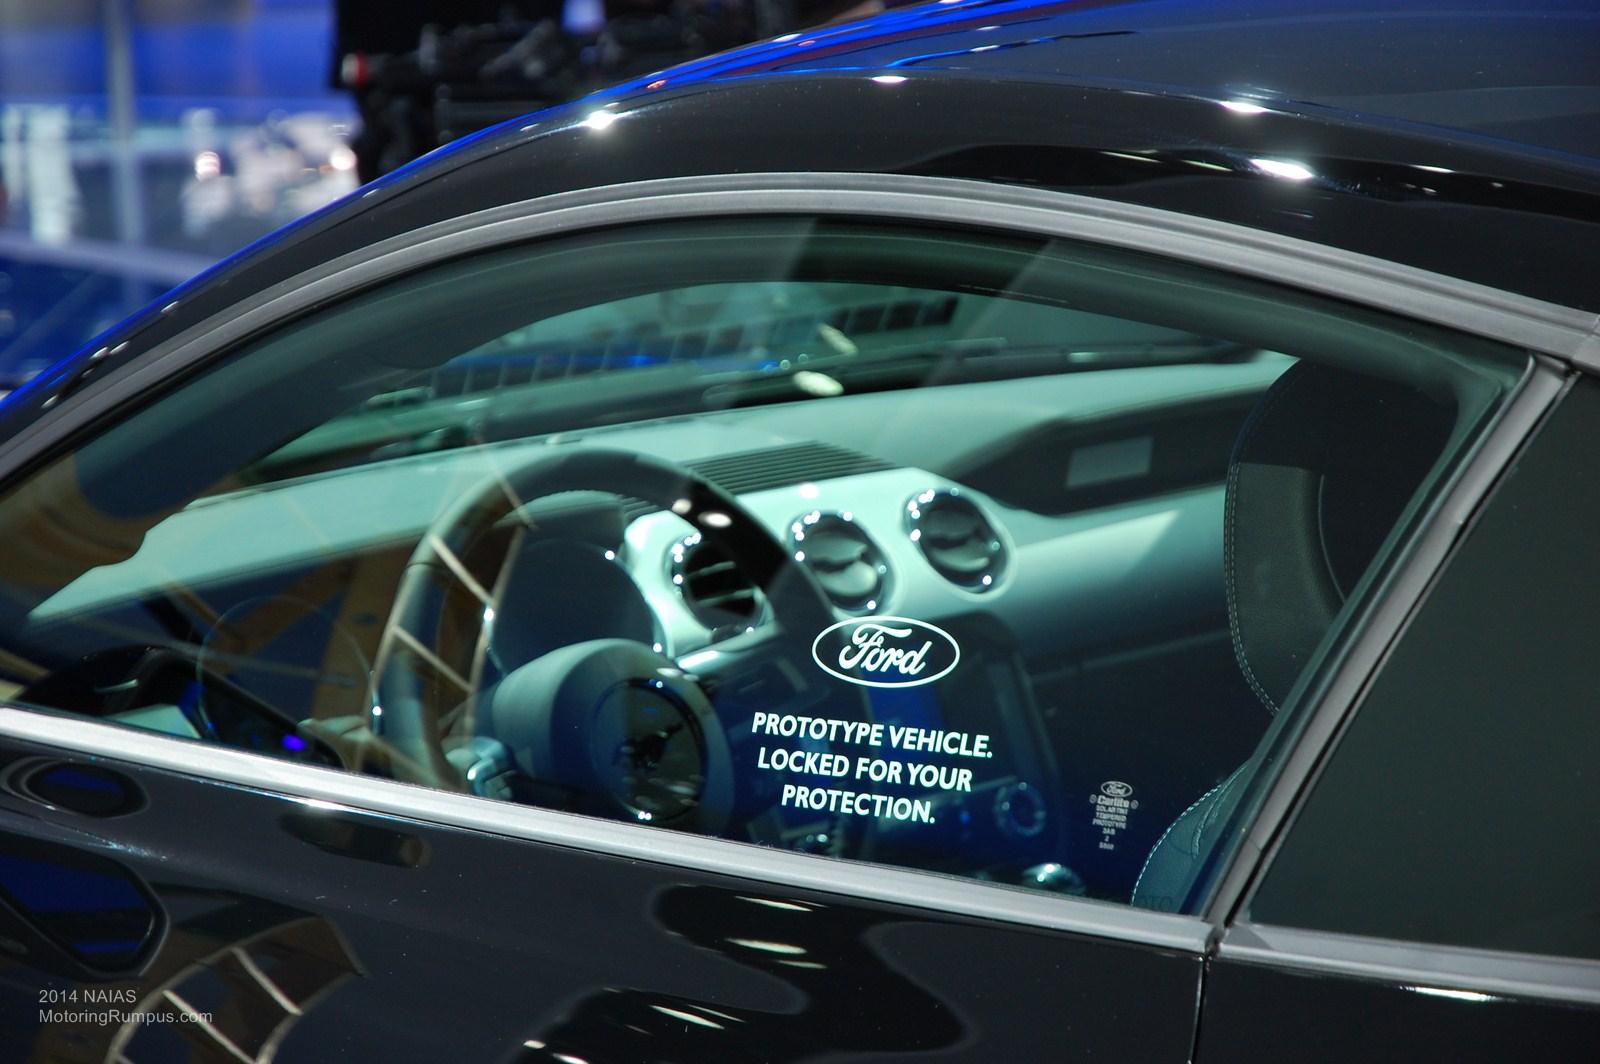 2014 NAIAS Ford 2015 Mustang Prototype